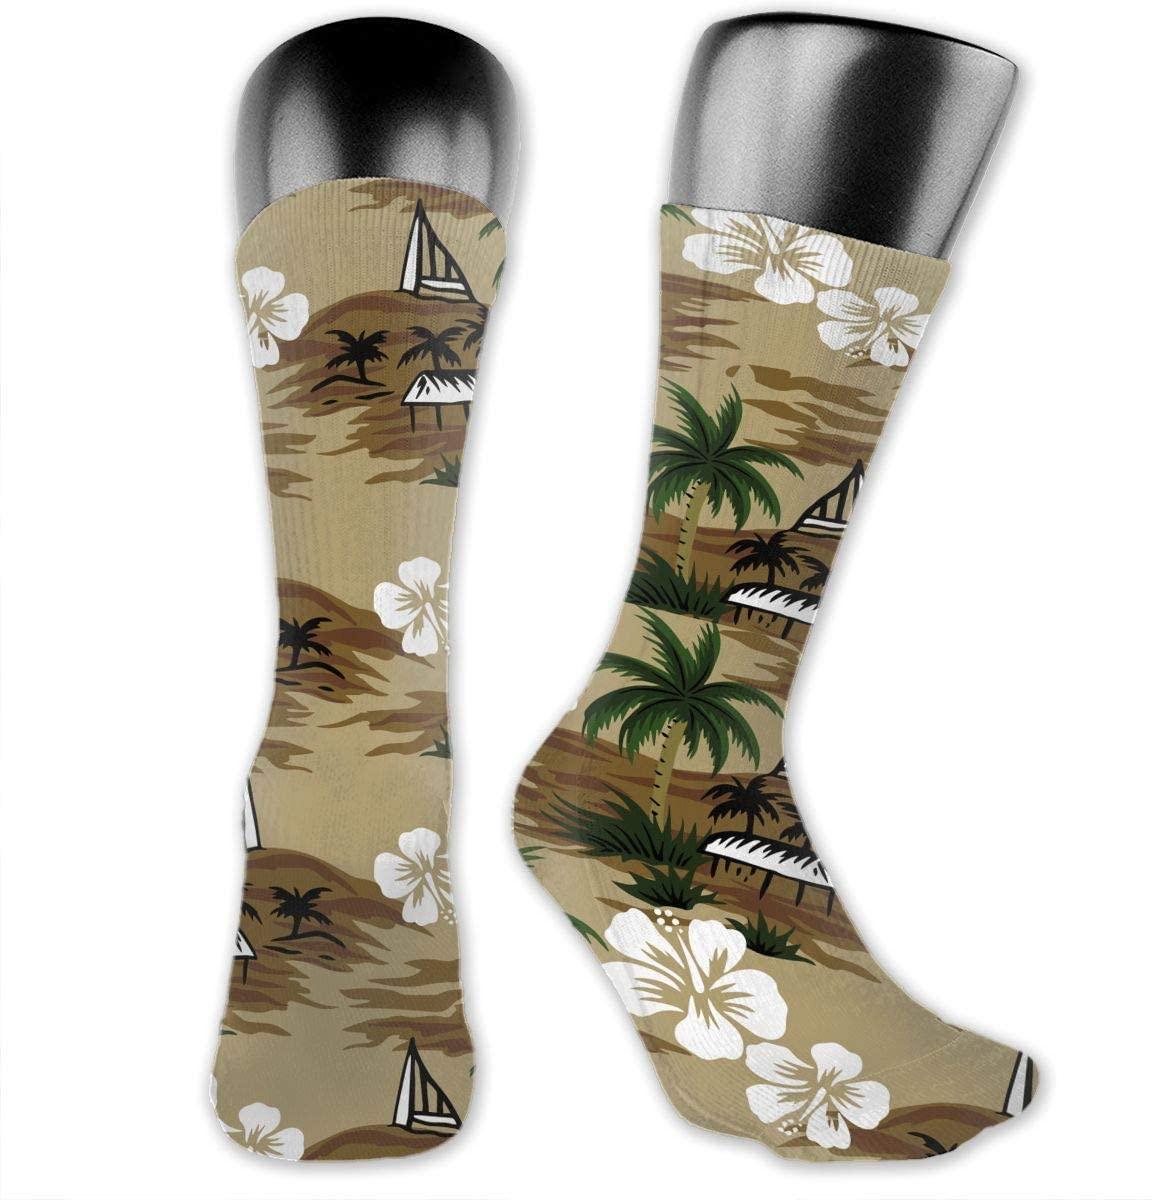 Palm Tree with Ship Unisex Outdoor Long Socks Sport Athletic Crew Socks Stockings